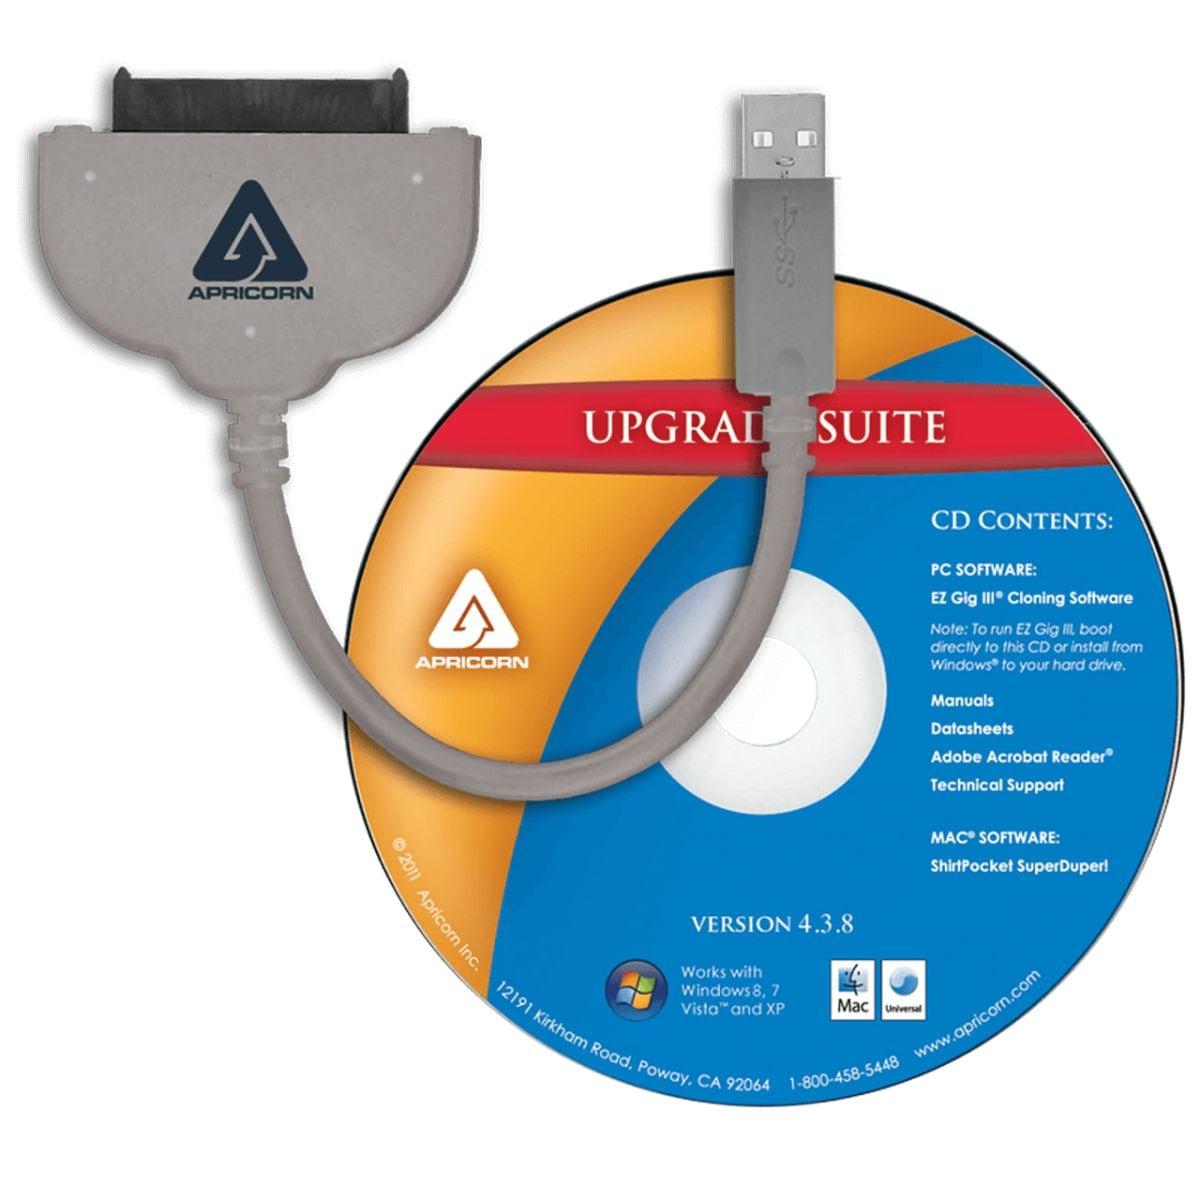 sata usb cable to any 25 sata drive clone software